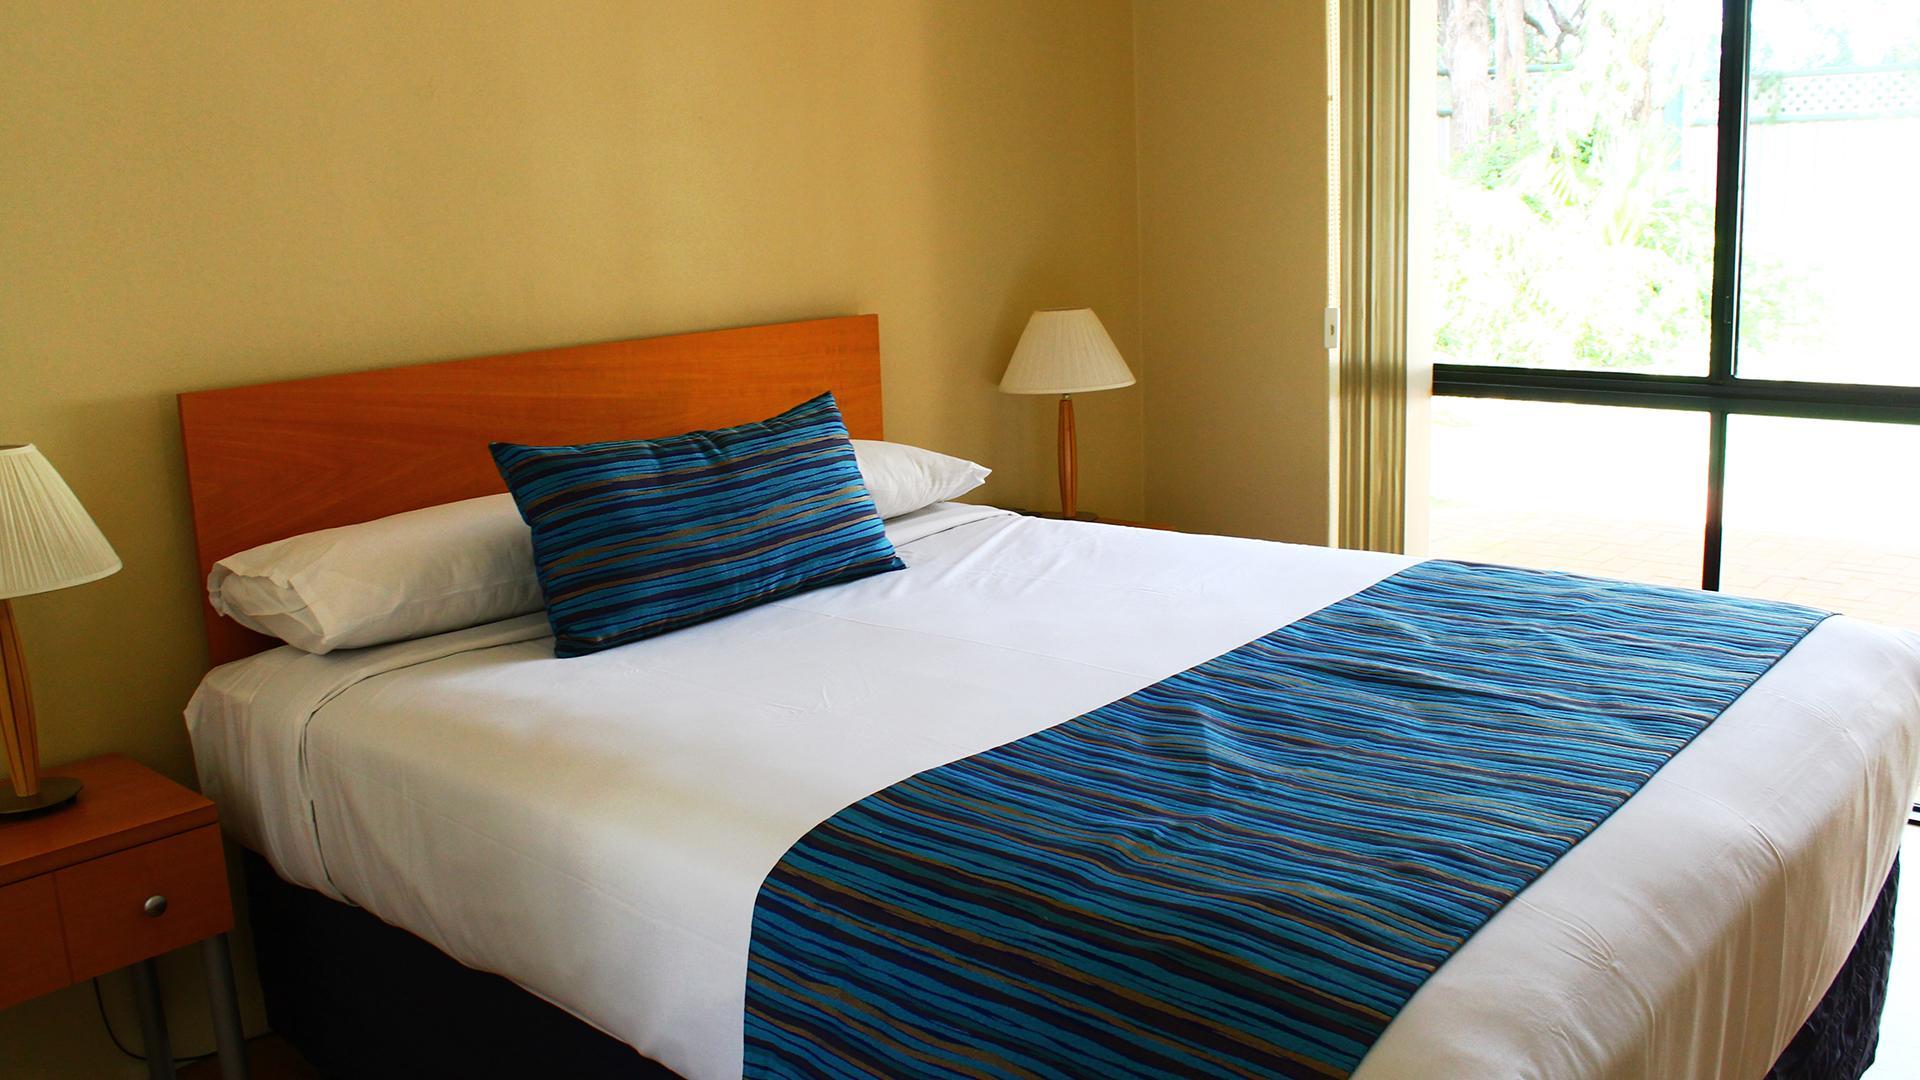 Two-Bedroom Villa  image 1 at Amalfi Resort Busselton by City of Busselton, Western Australia, Australia